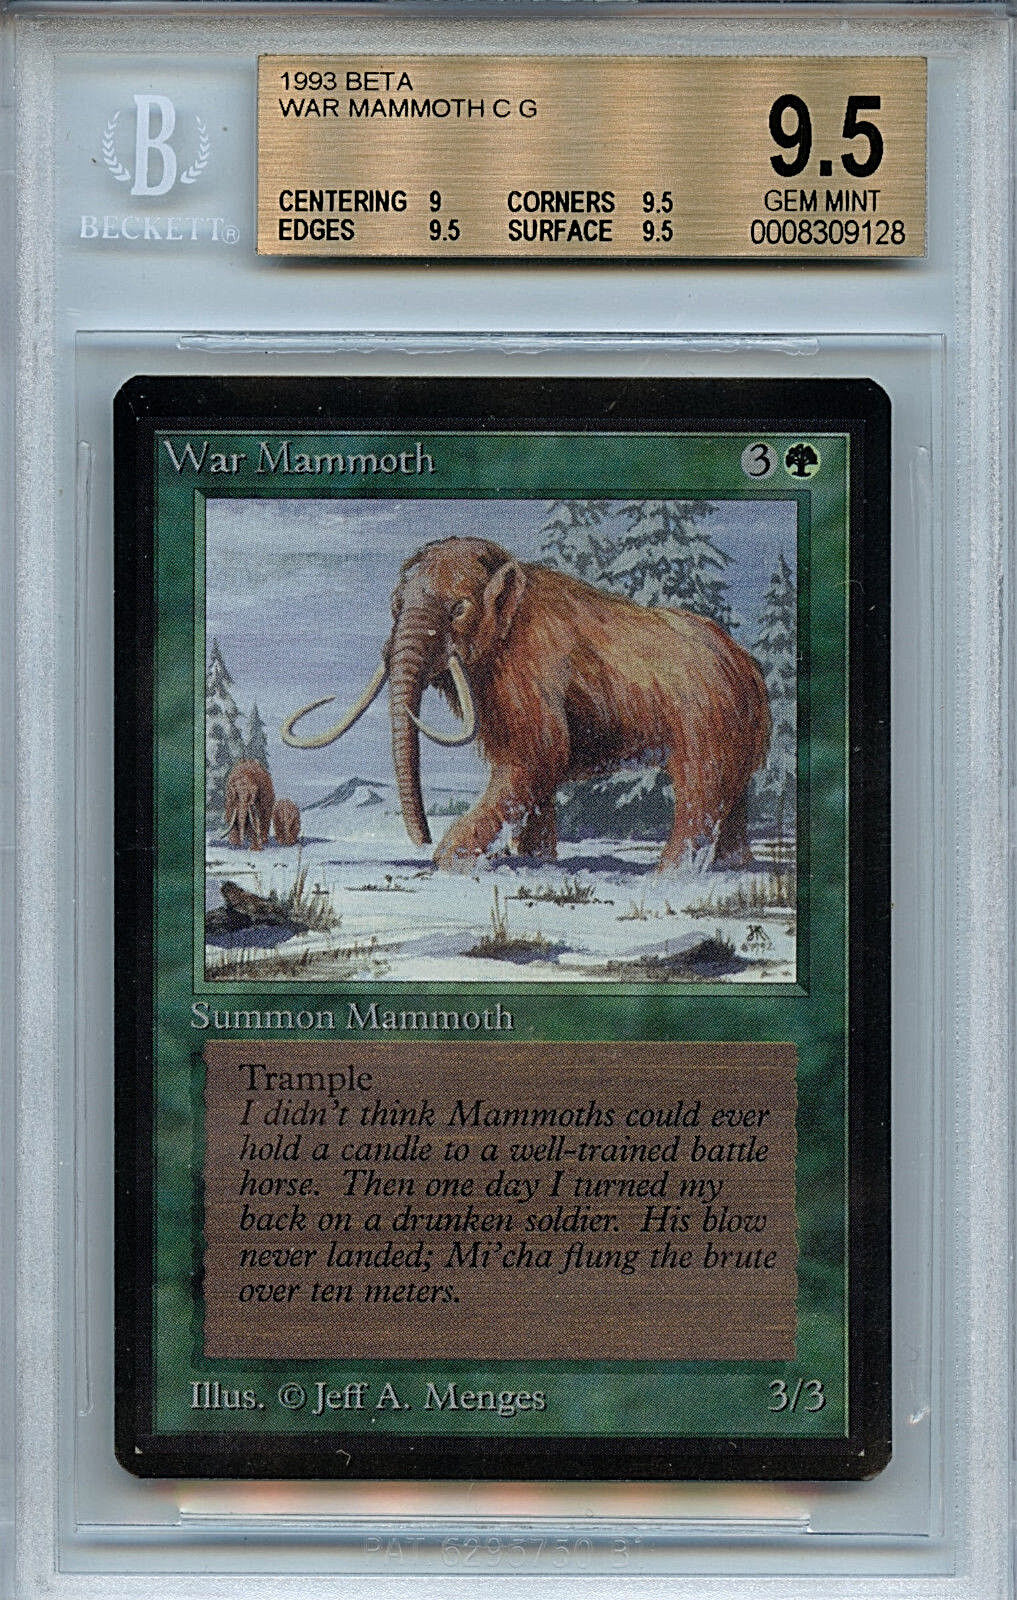 MTG Beta War Mammoth BGS BGS BGS 9.5 Gem Mint Card Magic WOTC 9128 6beff8